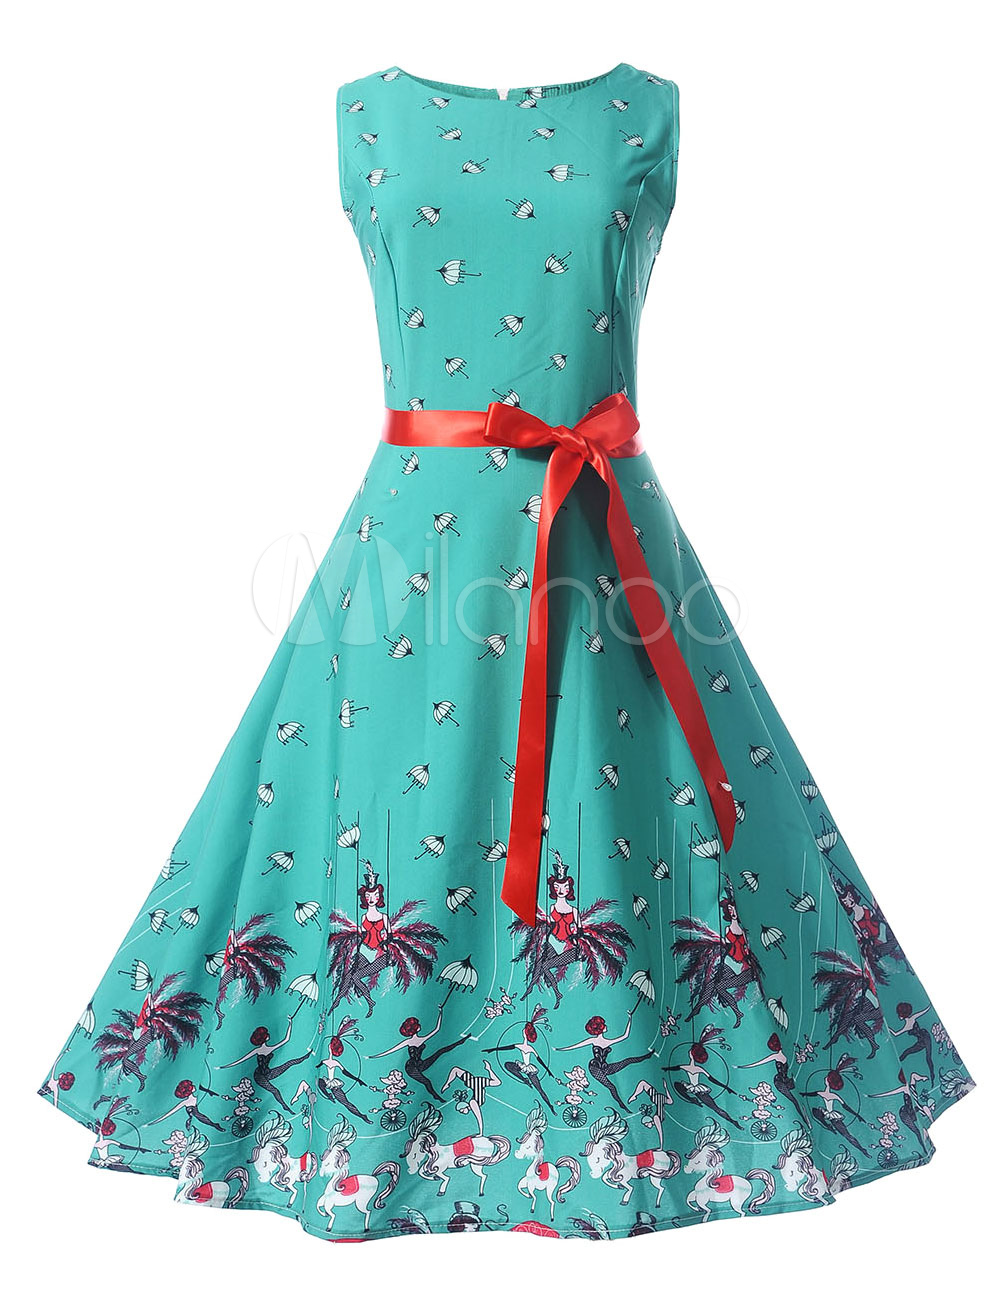 Green Vintage Dress Round Neck Sleeveless Floral Print Women's Summer Dresses (Women\\'s Clothing Vintage Dresses) photo